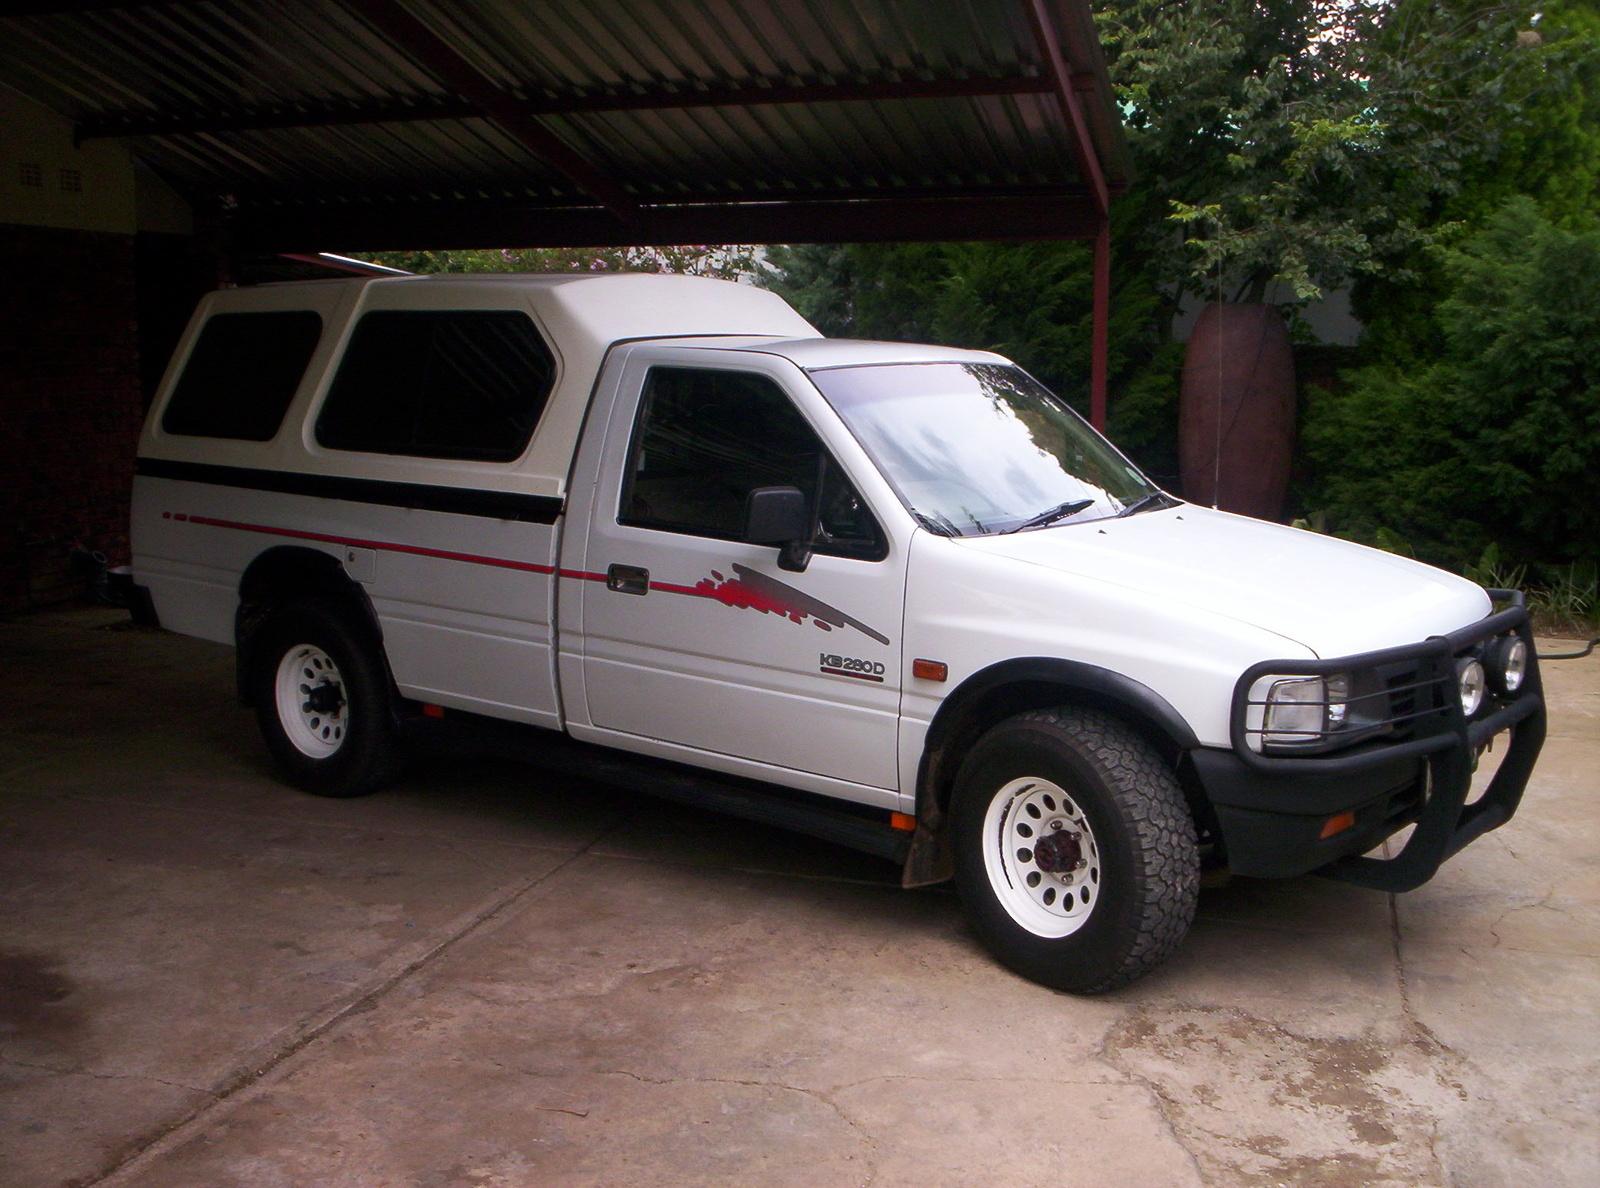 1993 Isuzu Pickup - Overview - CarGurus